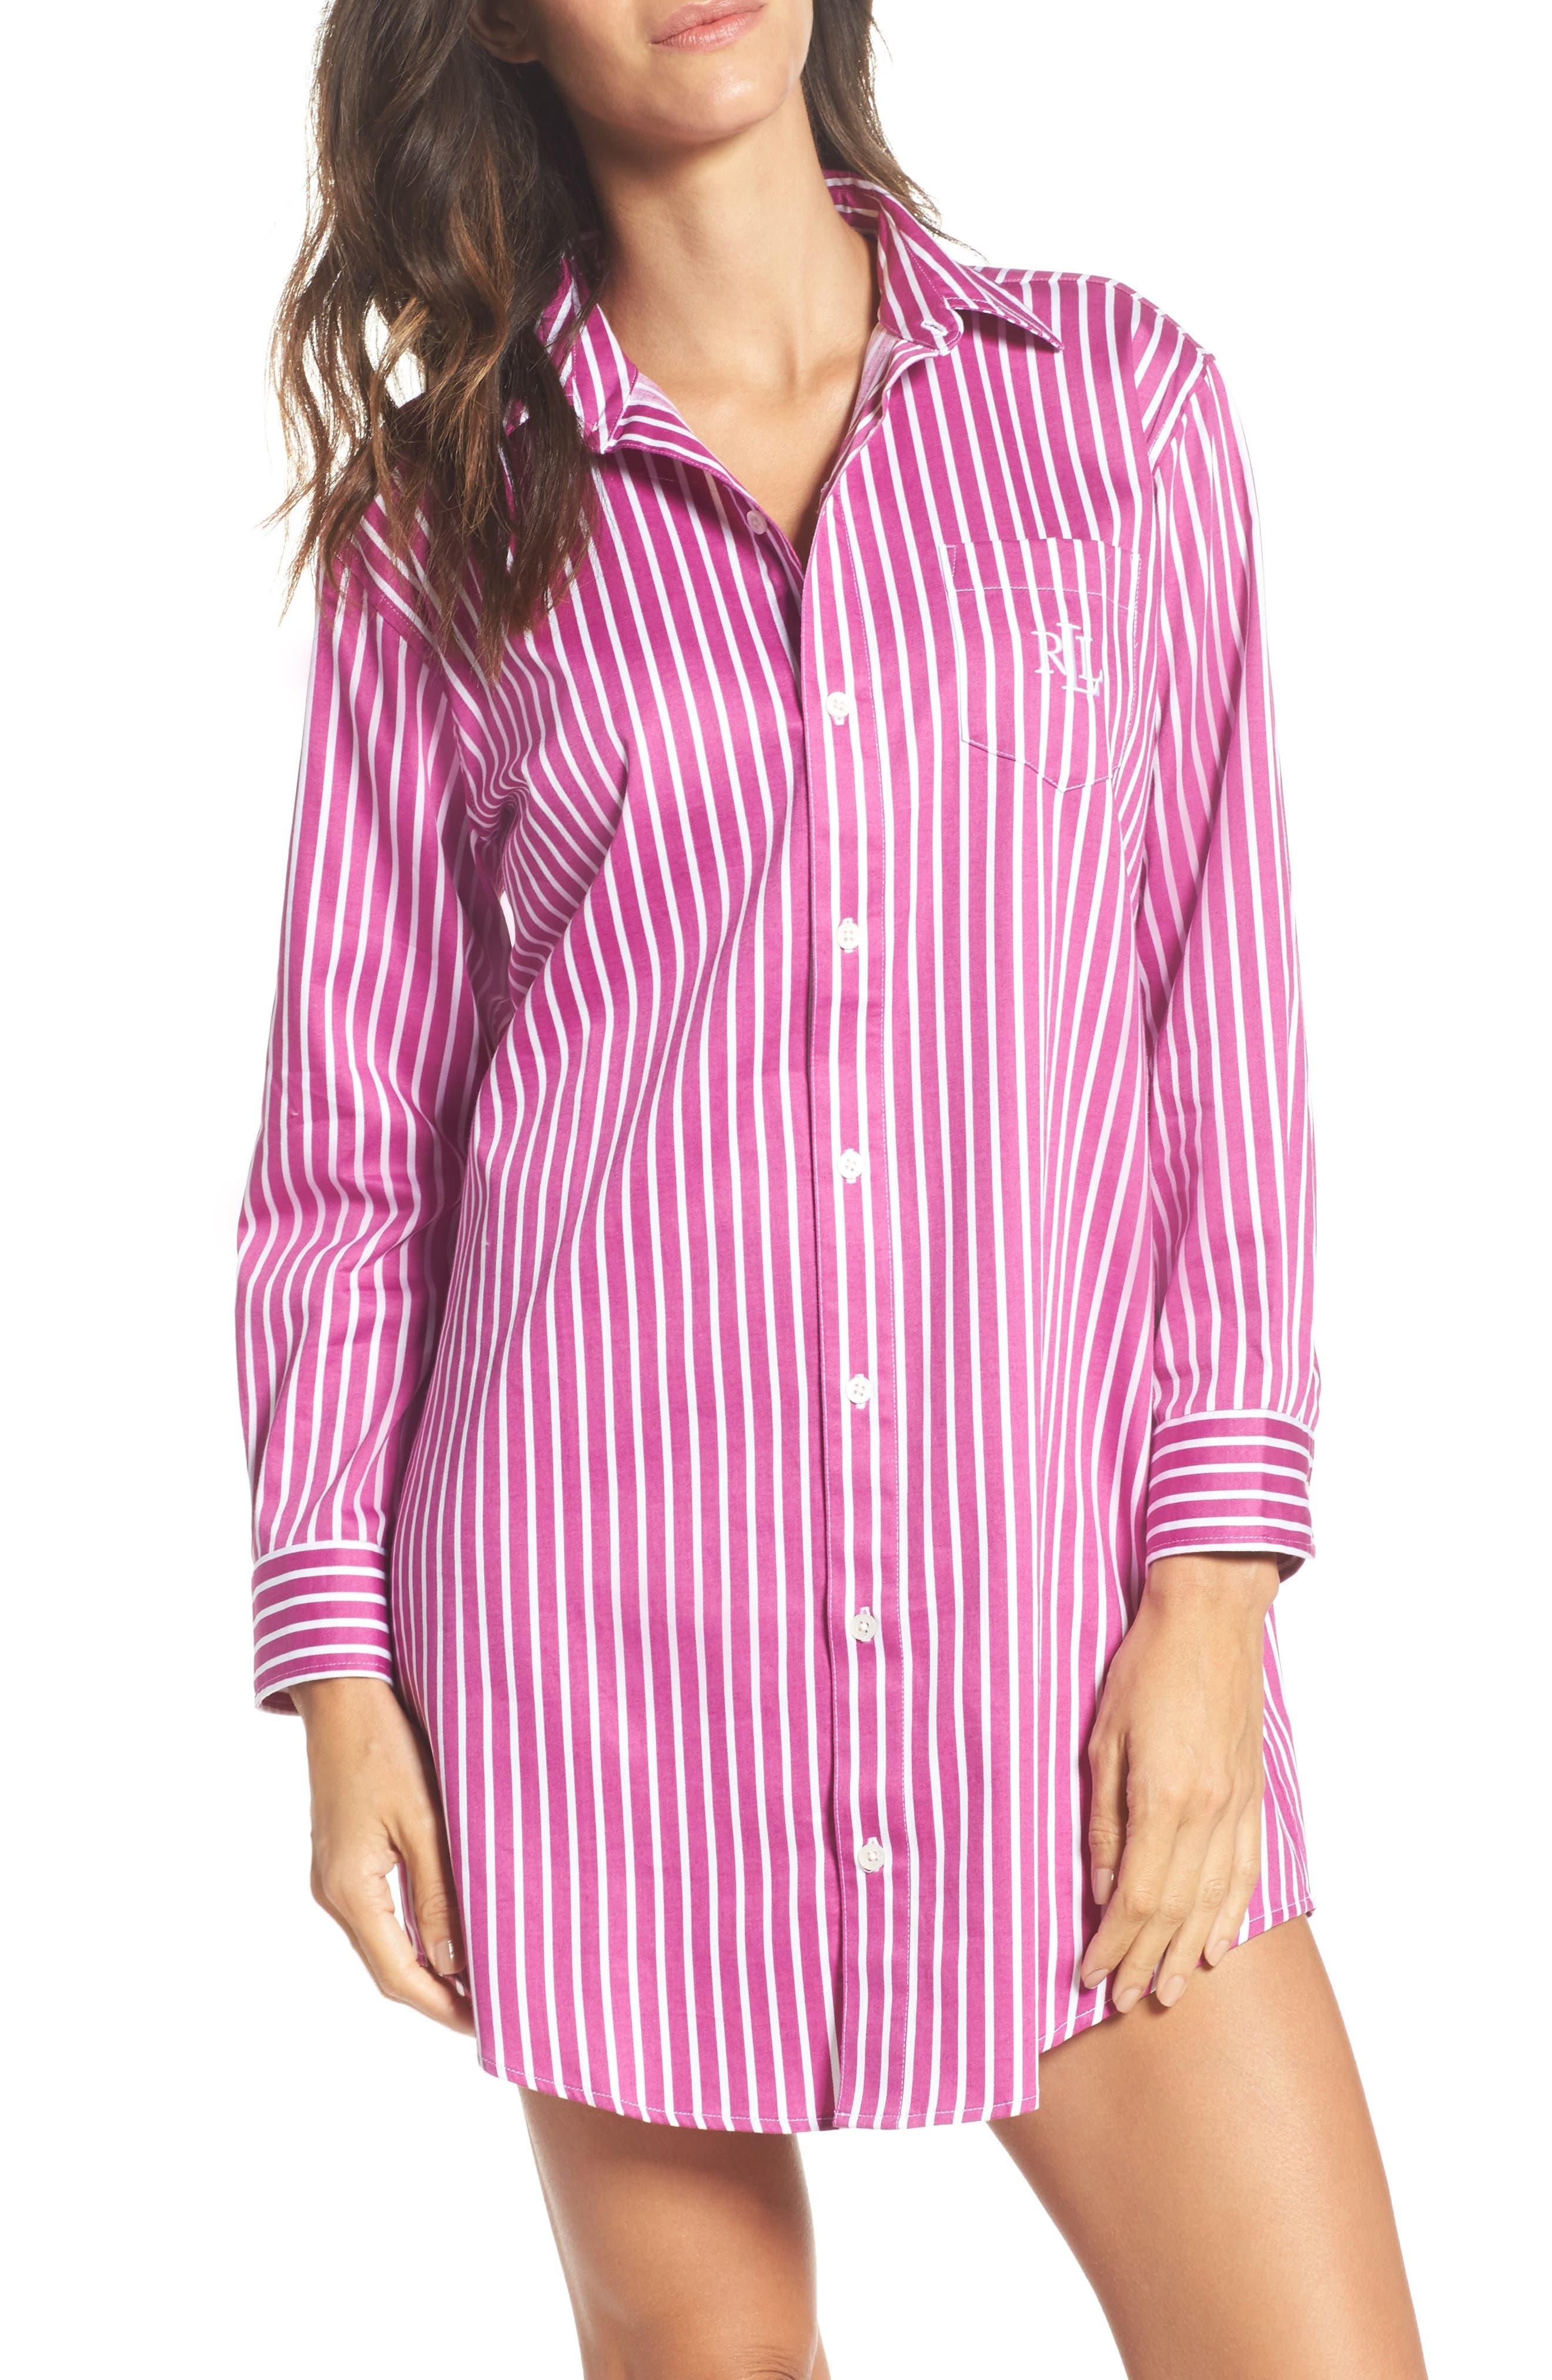 Sleep Shirt,                             Main thumbnail 1, color,                             690